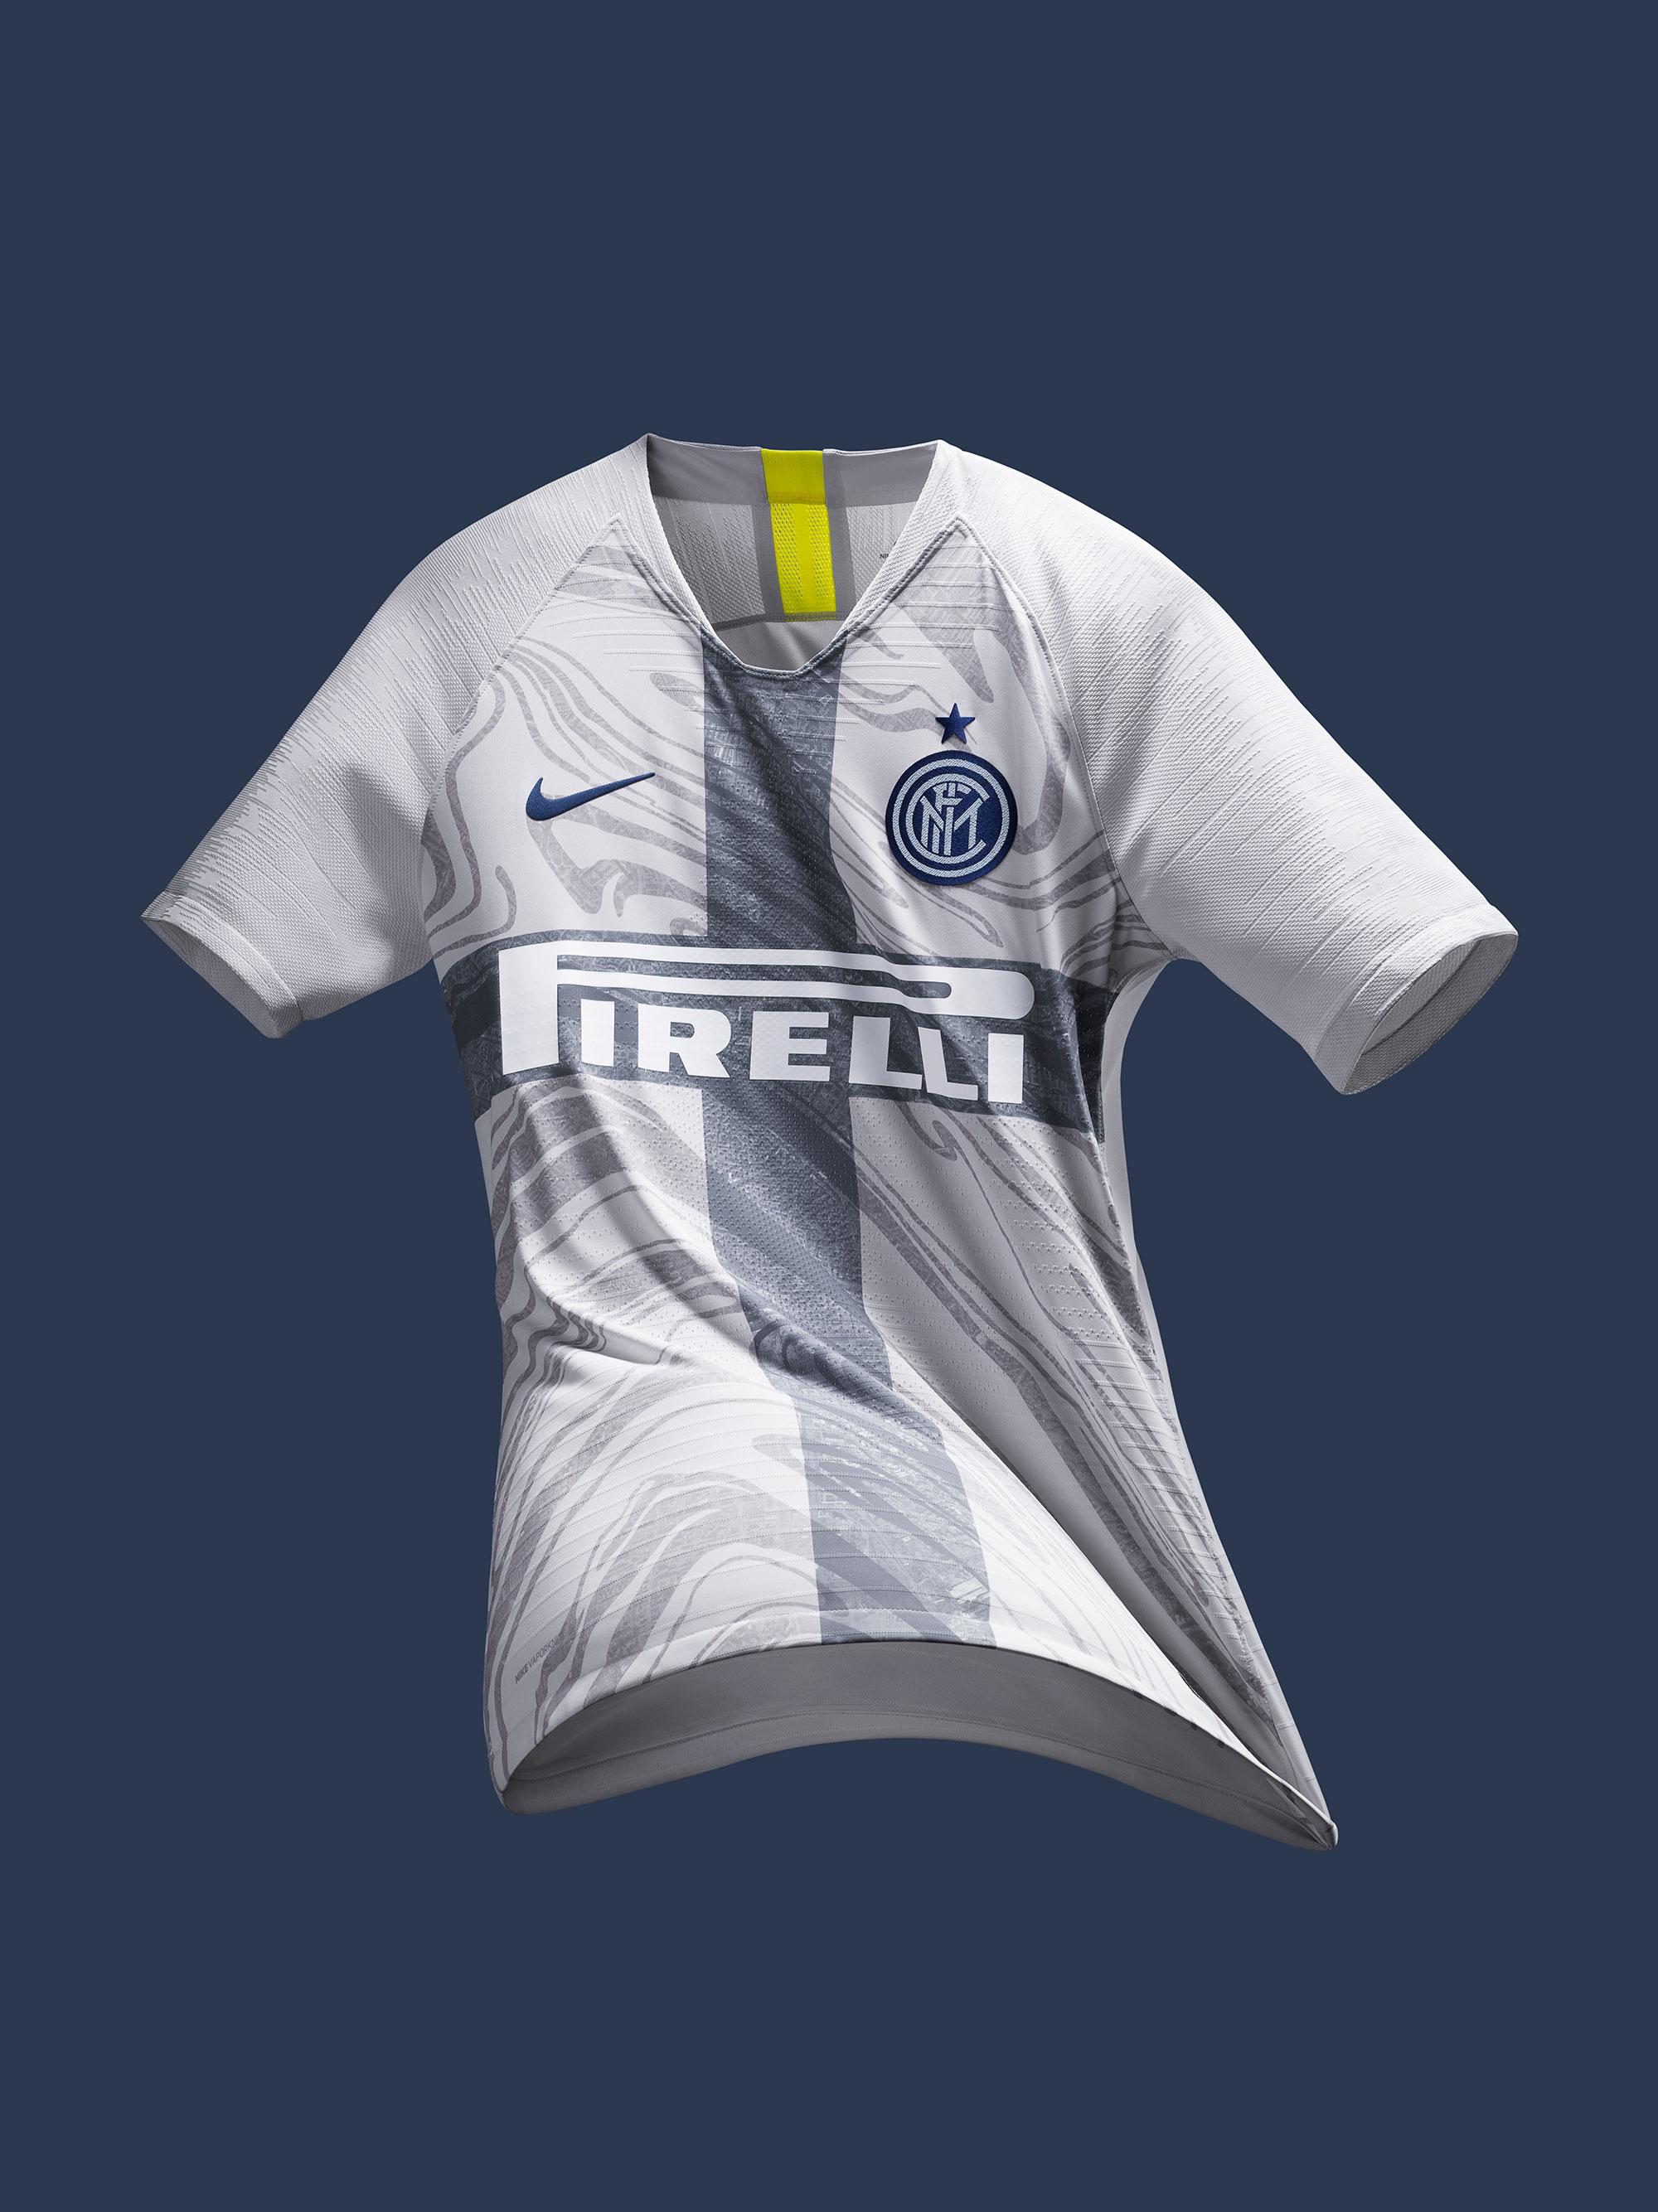 Inter Milan Reveal Their 2018 19 Third Kit From Nike 48989a684